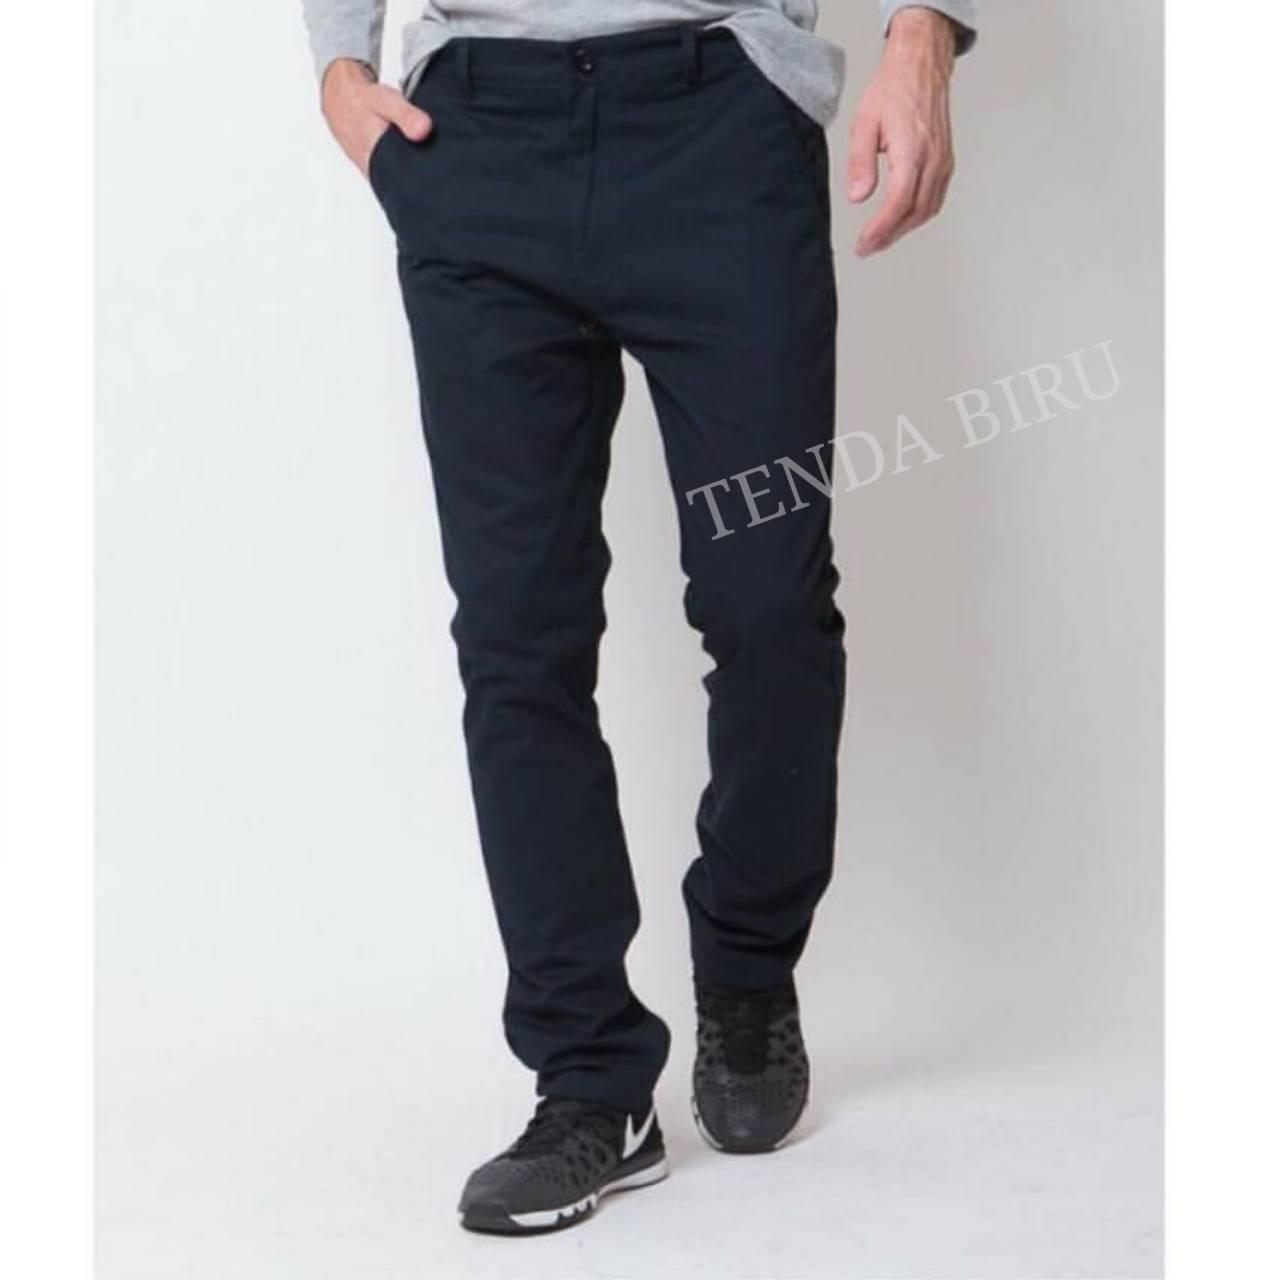 Pants Chino Celana Pendek Pria Panjang Exlusive Trendy